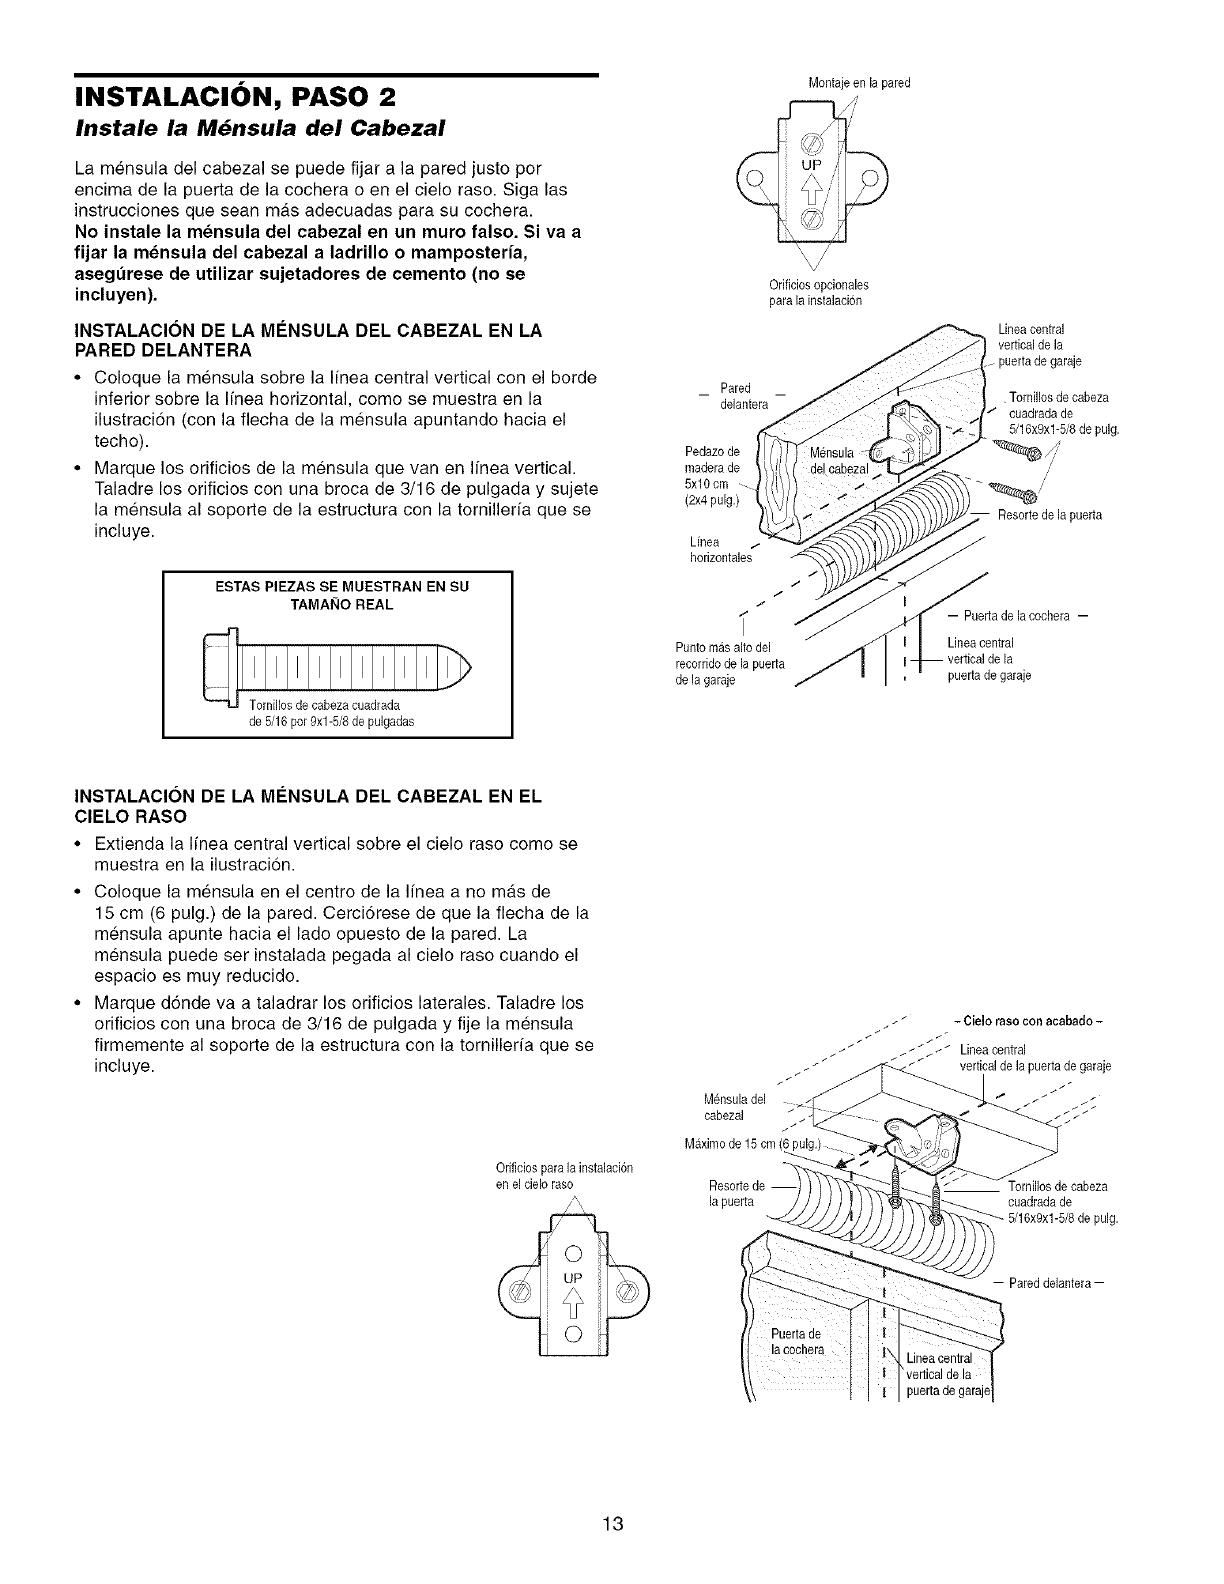 craftsman 13953930dm user manual garage door opener manuals and Garage Electrical Wiring Diagrams instalaci n paso 2